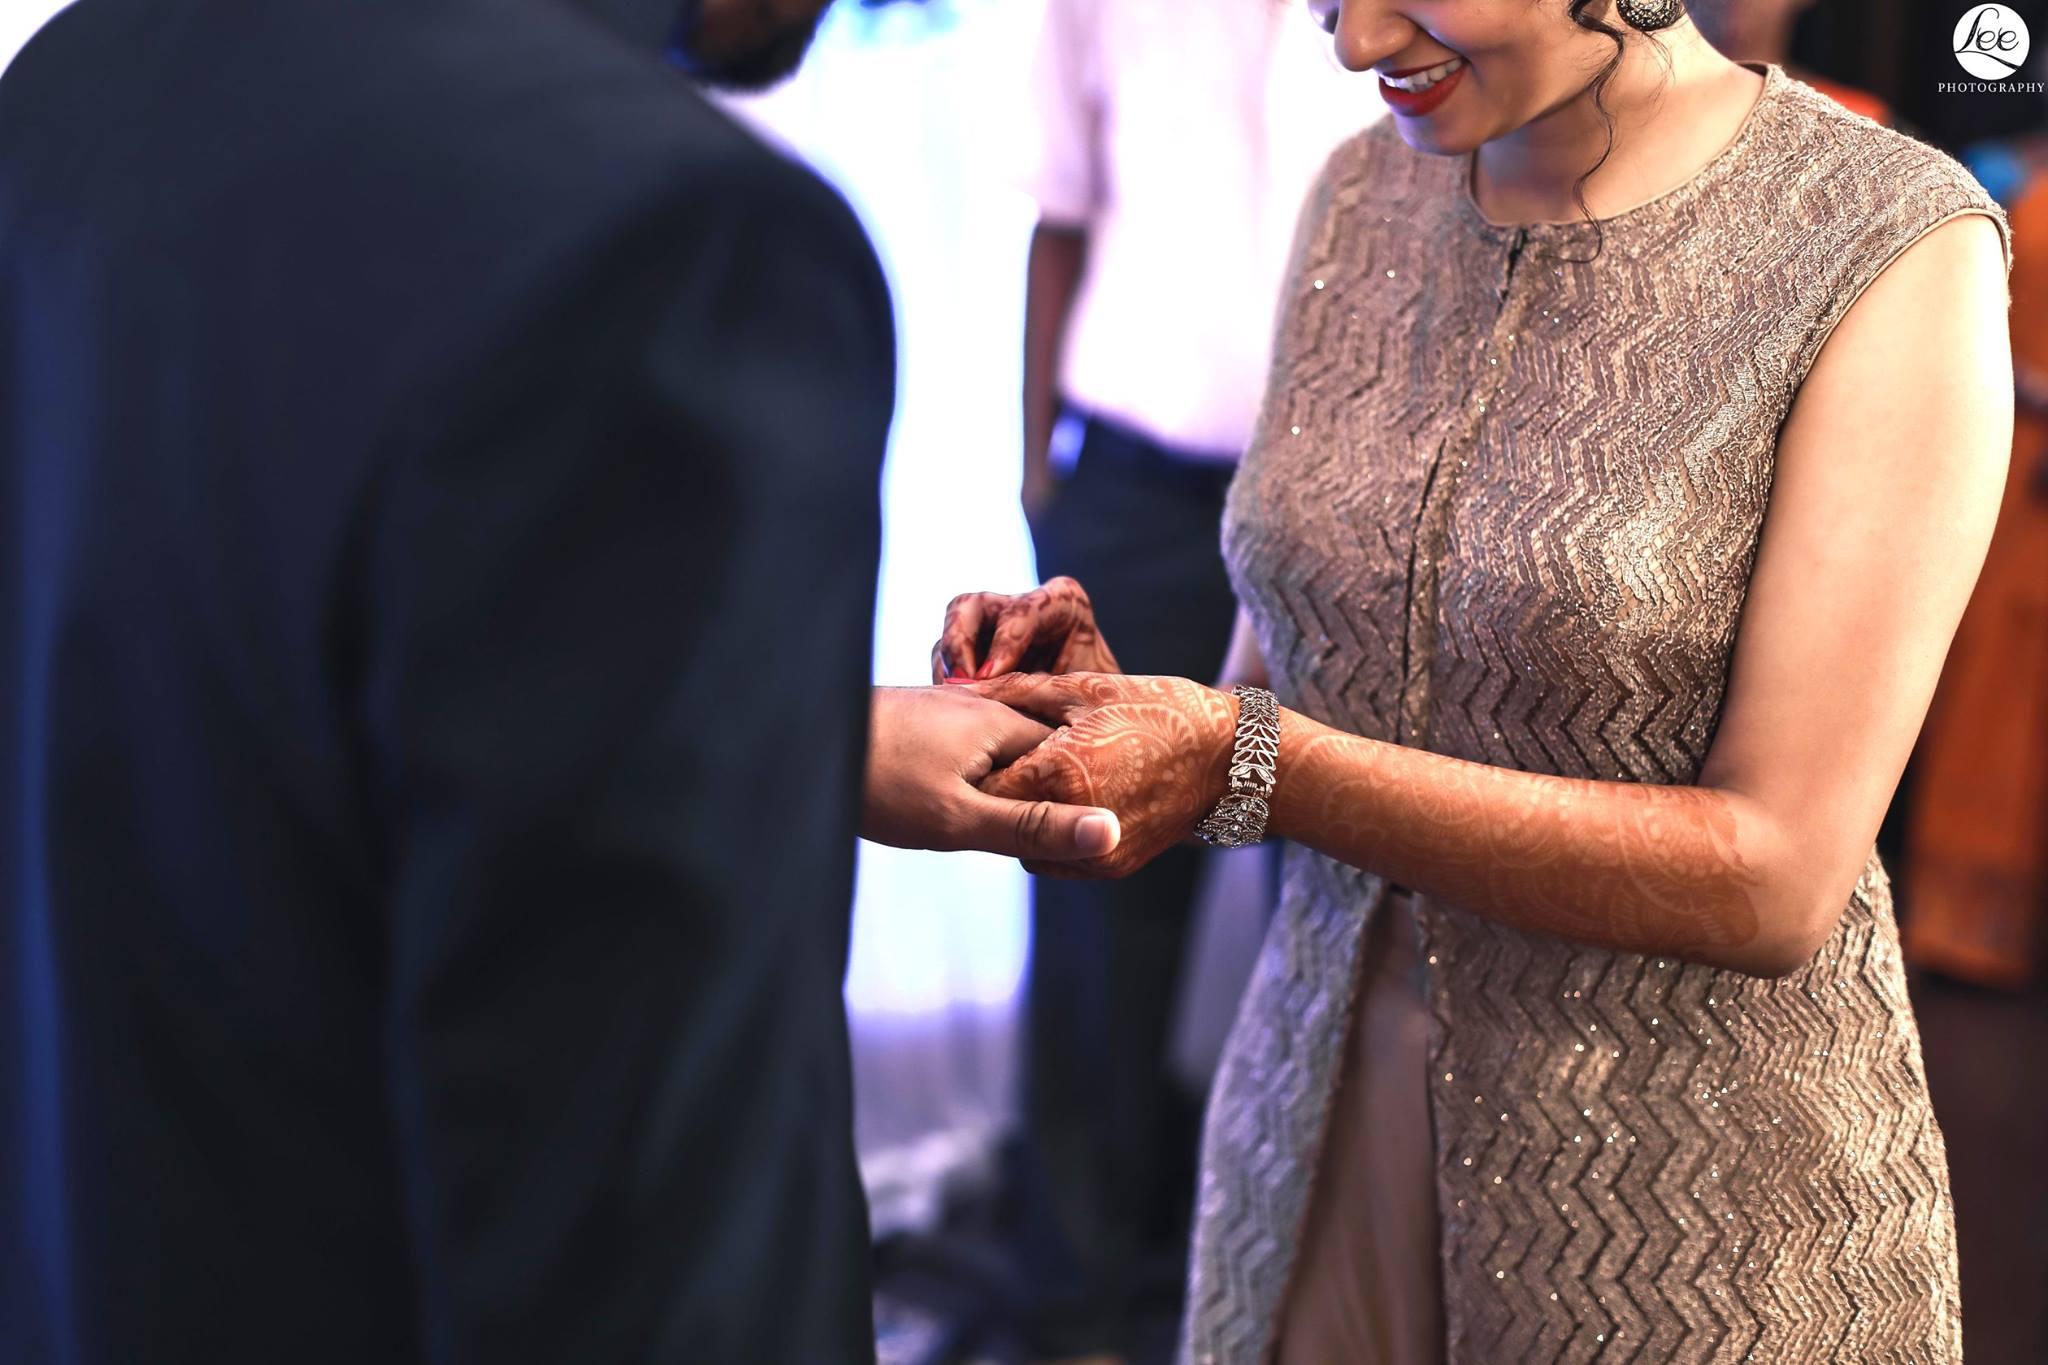 Deepak Sridhar with Megha Parthasarathy-17